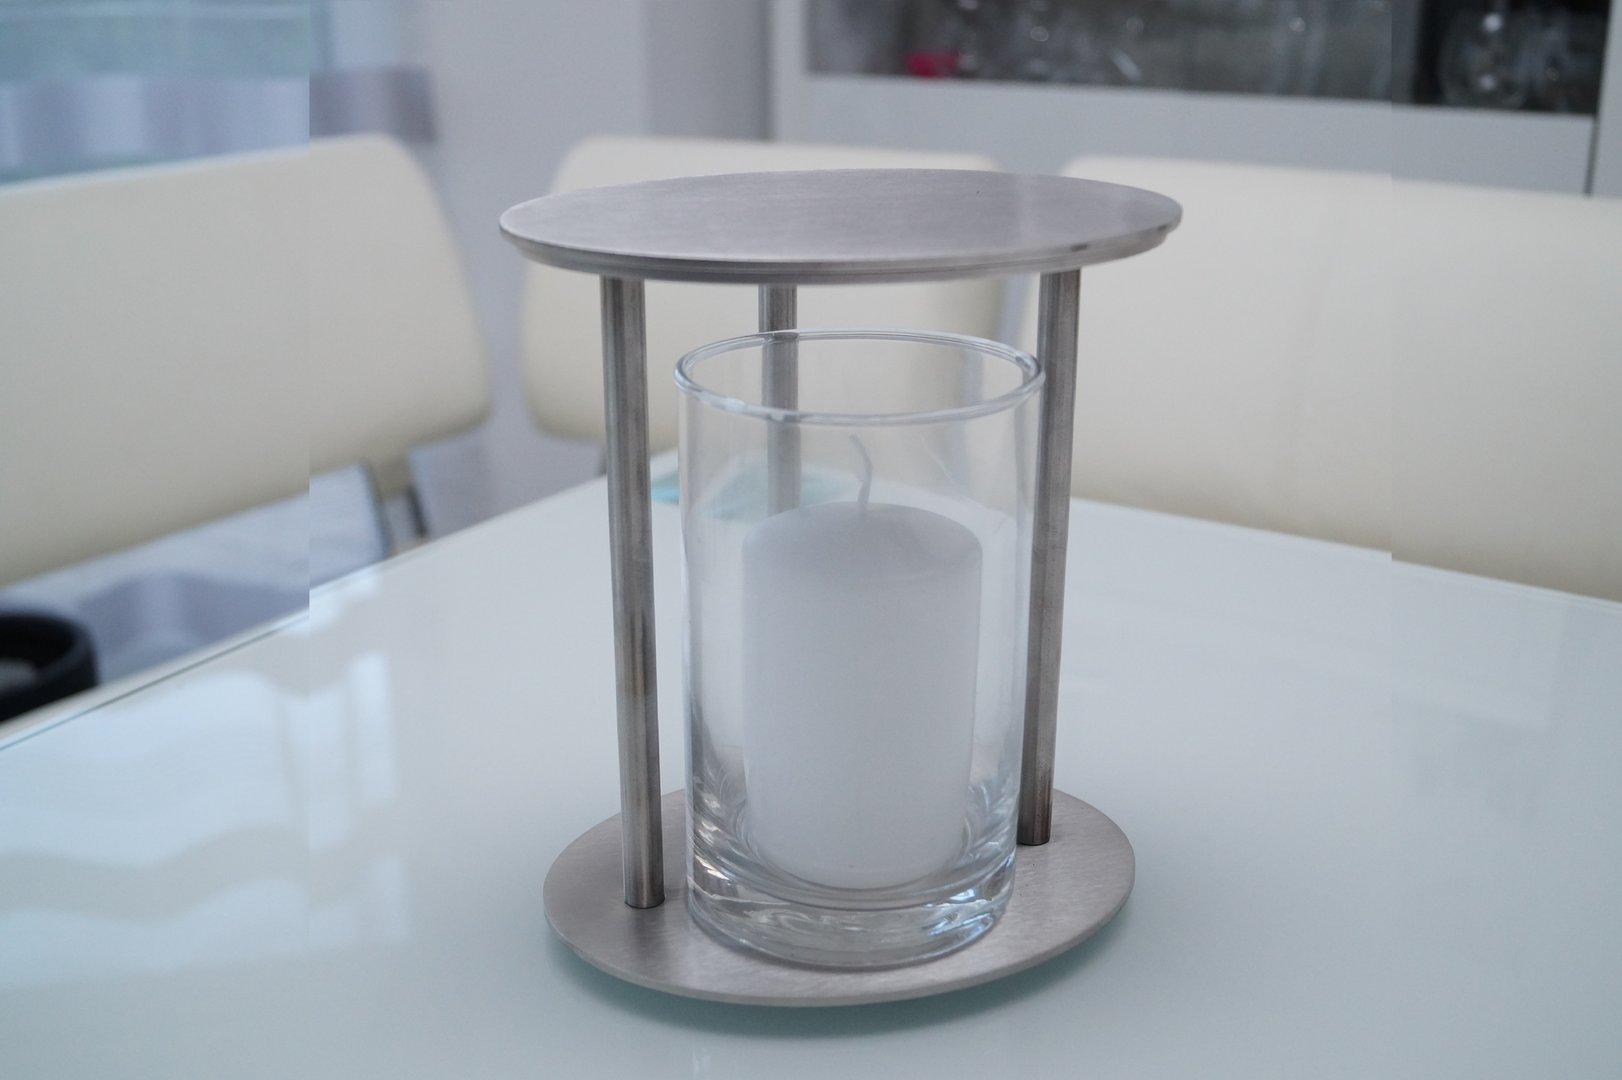 windlicht grablicht laterne rostfrei oval k s e shop. Black Bedroom Furniture Sets. Home Design Ideas